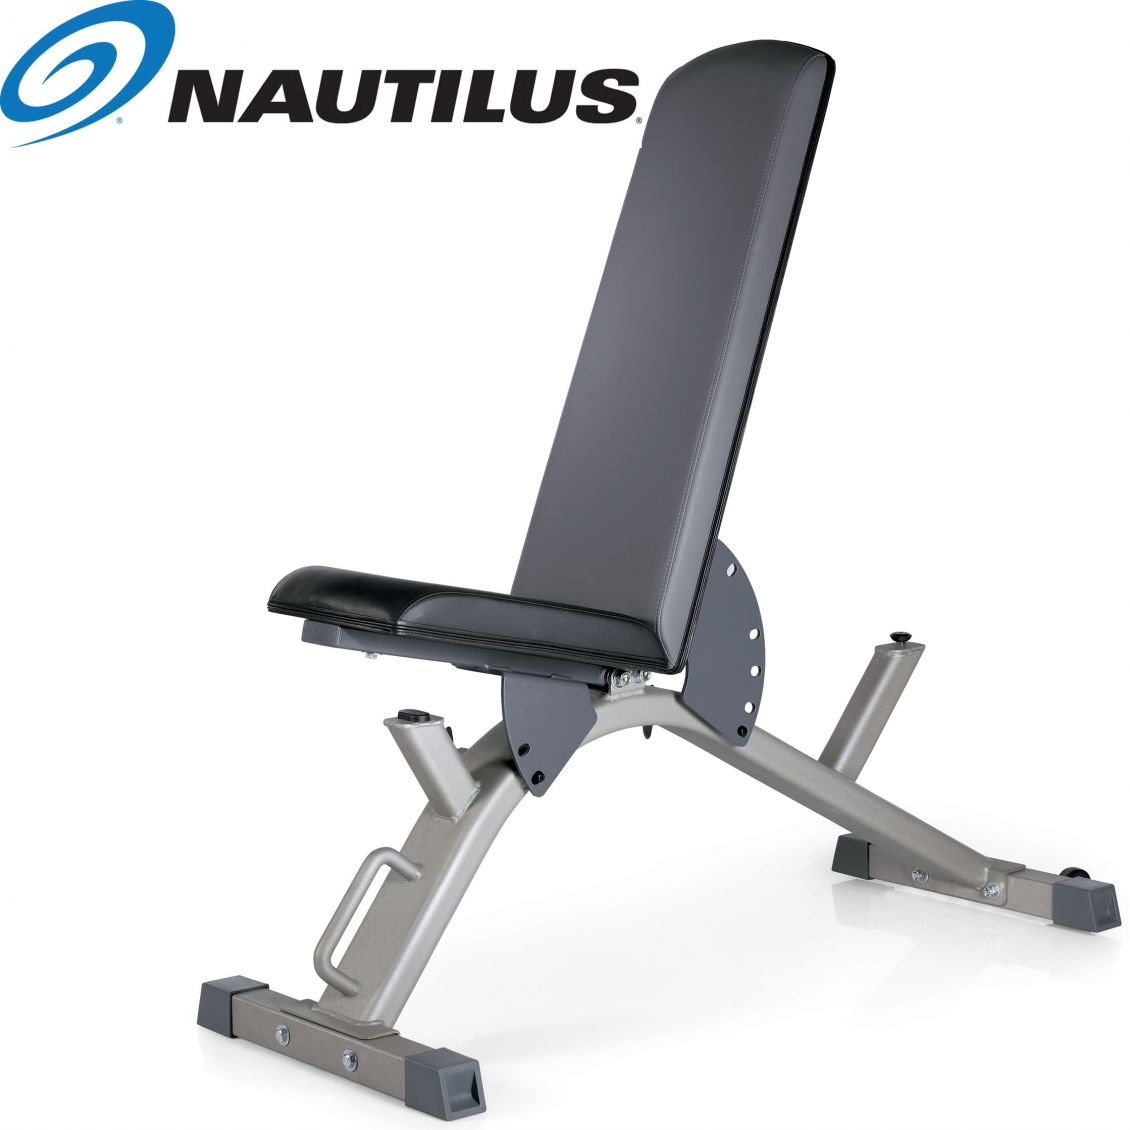 Nautilus Fitness